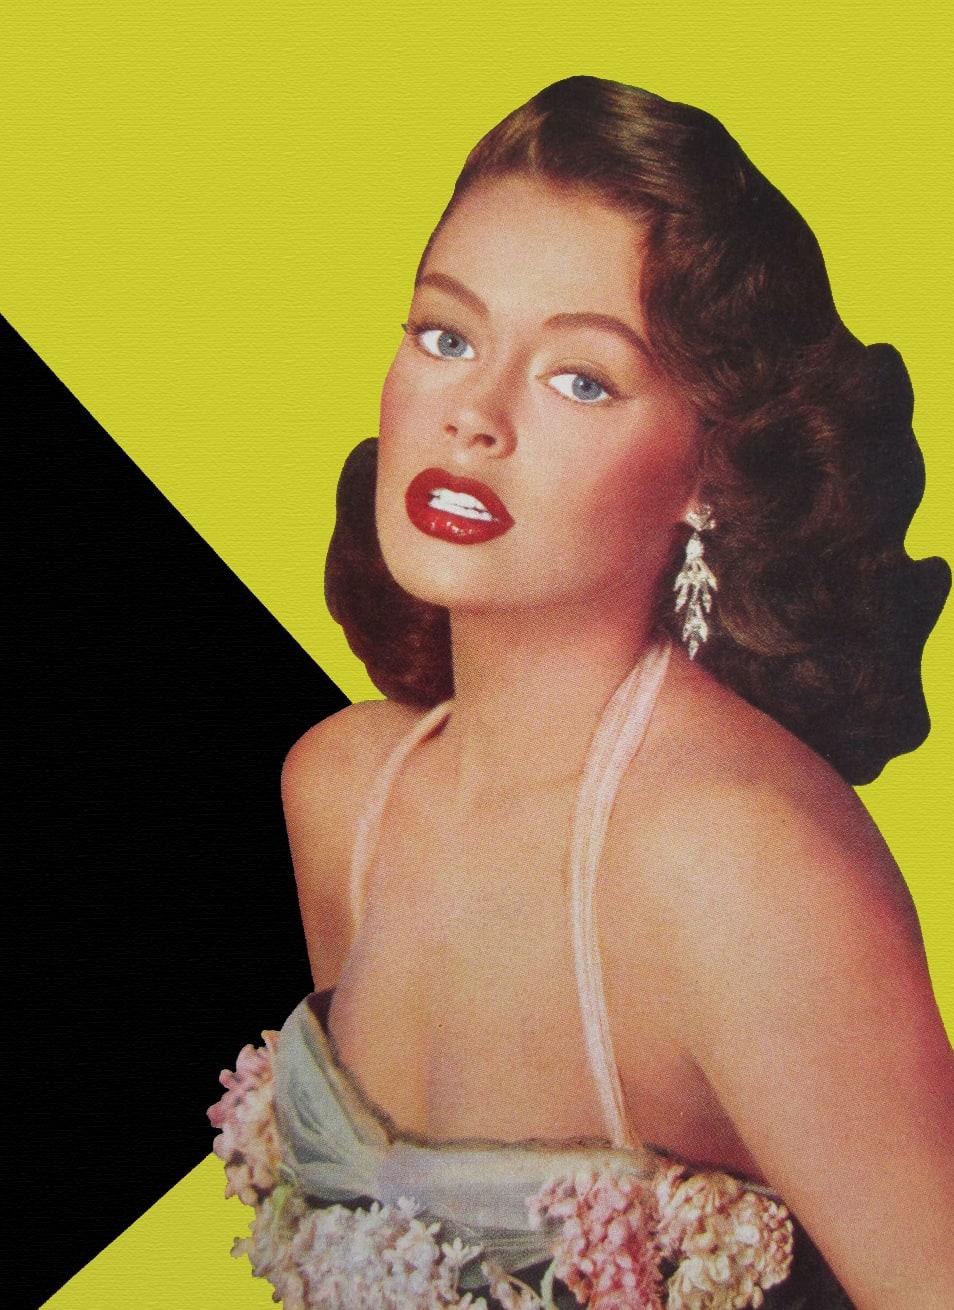 Simon MacCorkindale (1952?010) Erotic pics & movies Camila Sagardia,Dianna Agron born April 30, 1986 (age 32)